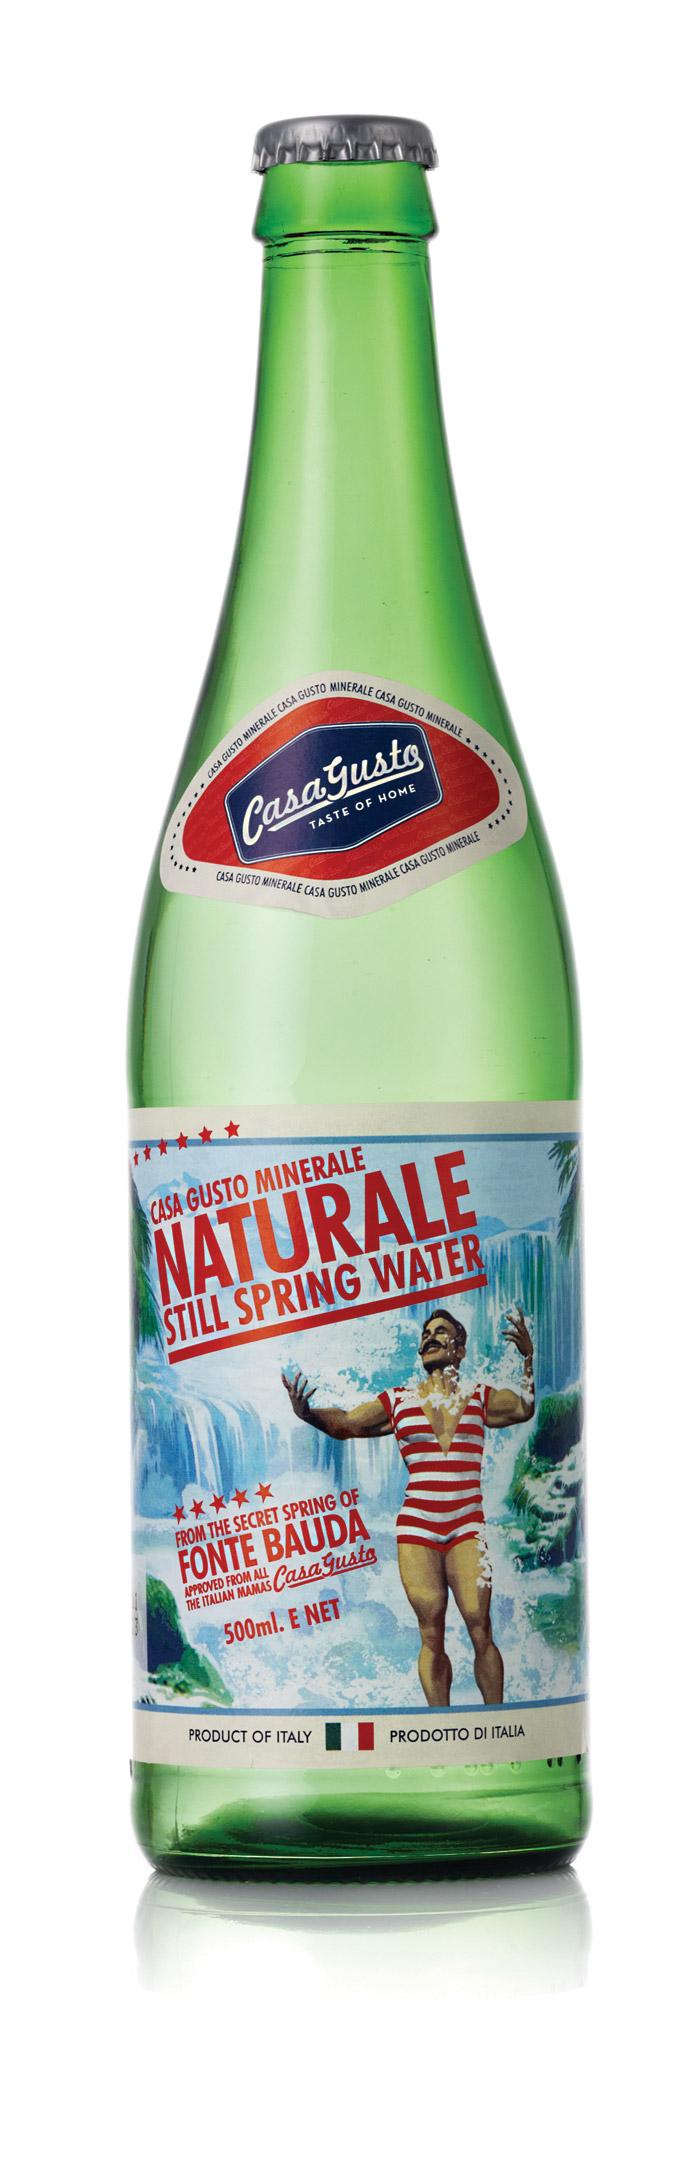 CG Naturale Water cmyk